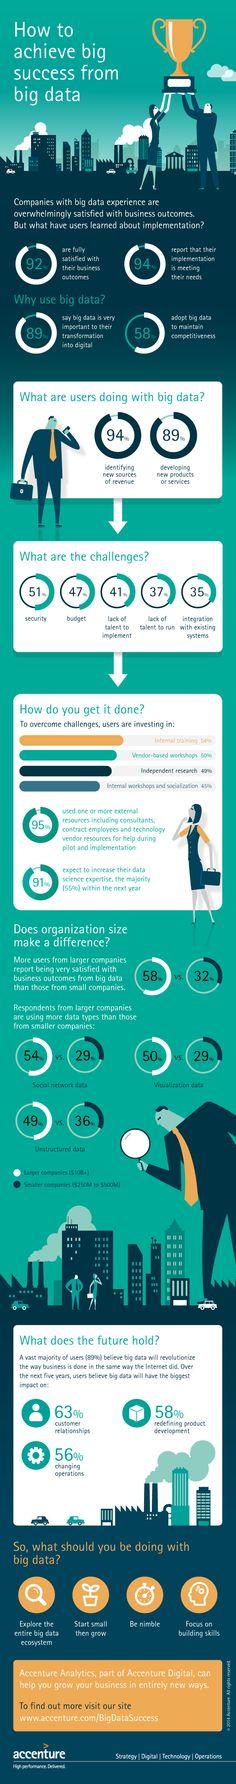 How to Achieve Big Success from Big Data - Infographic - Accenture Big Data, Ap Statistics, Digital Board, Visualisation, Career Planning, Business Intelligence, Data Analytics, Cloud Computing, Data Science